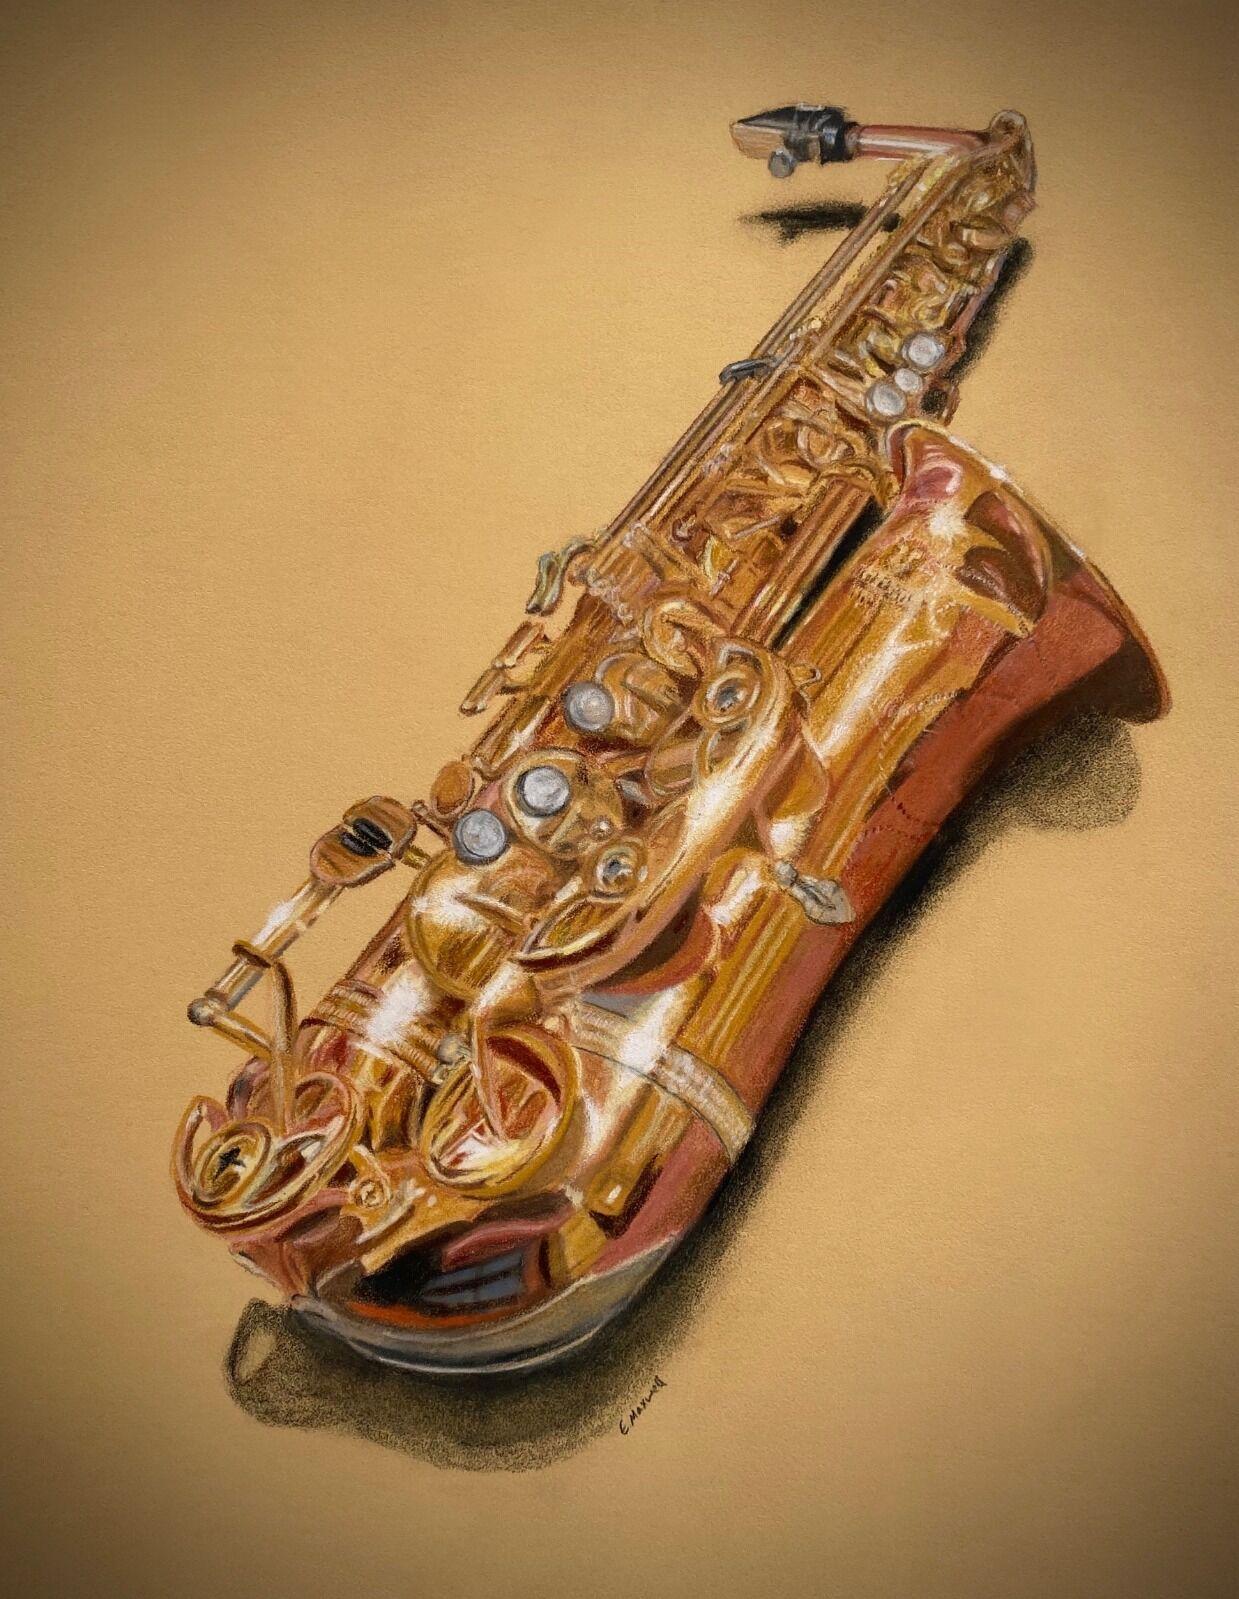 Alto Saxophone (Yanagisawa A902)